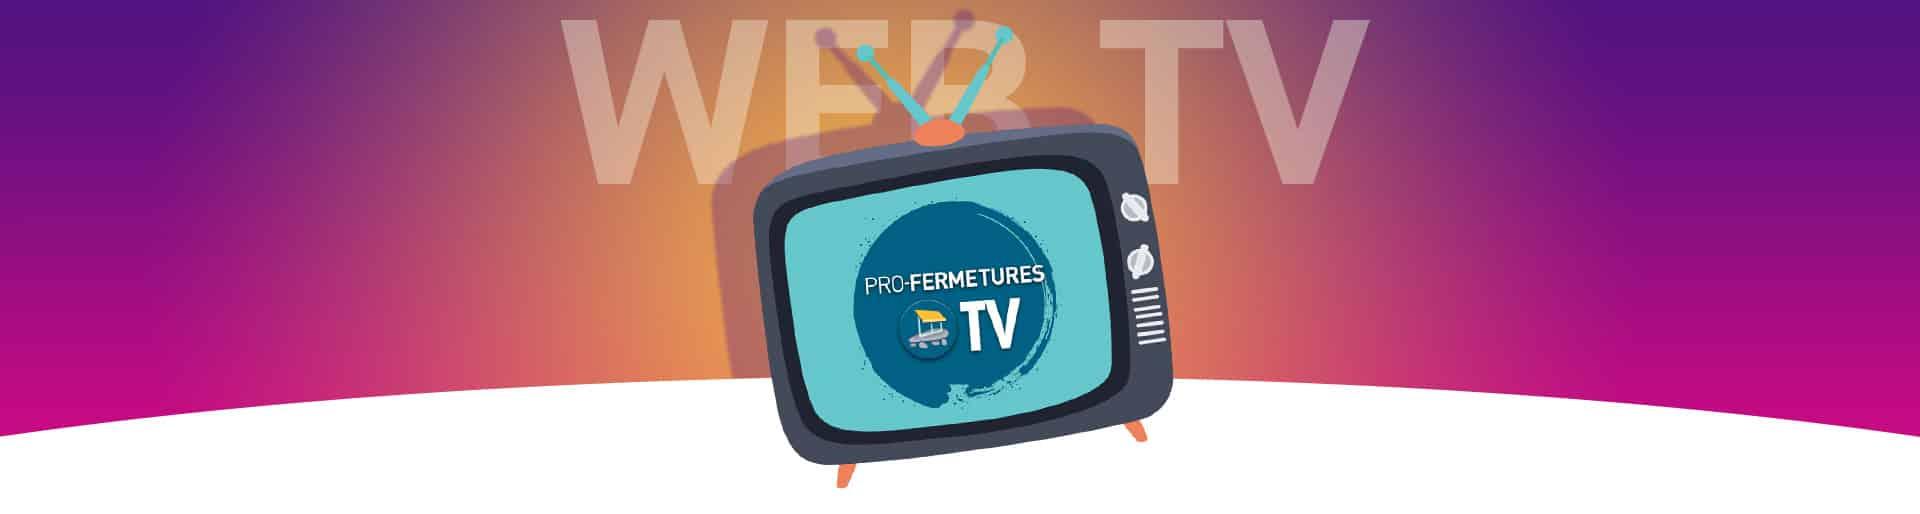 Header page webTV / Pro-Fermetures